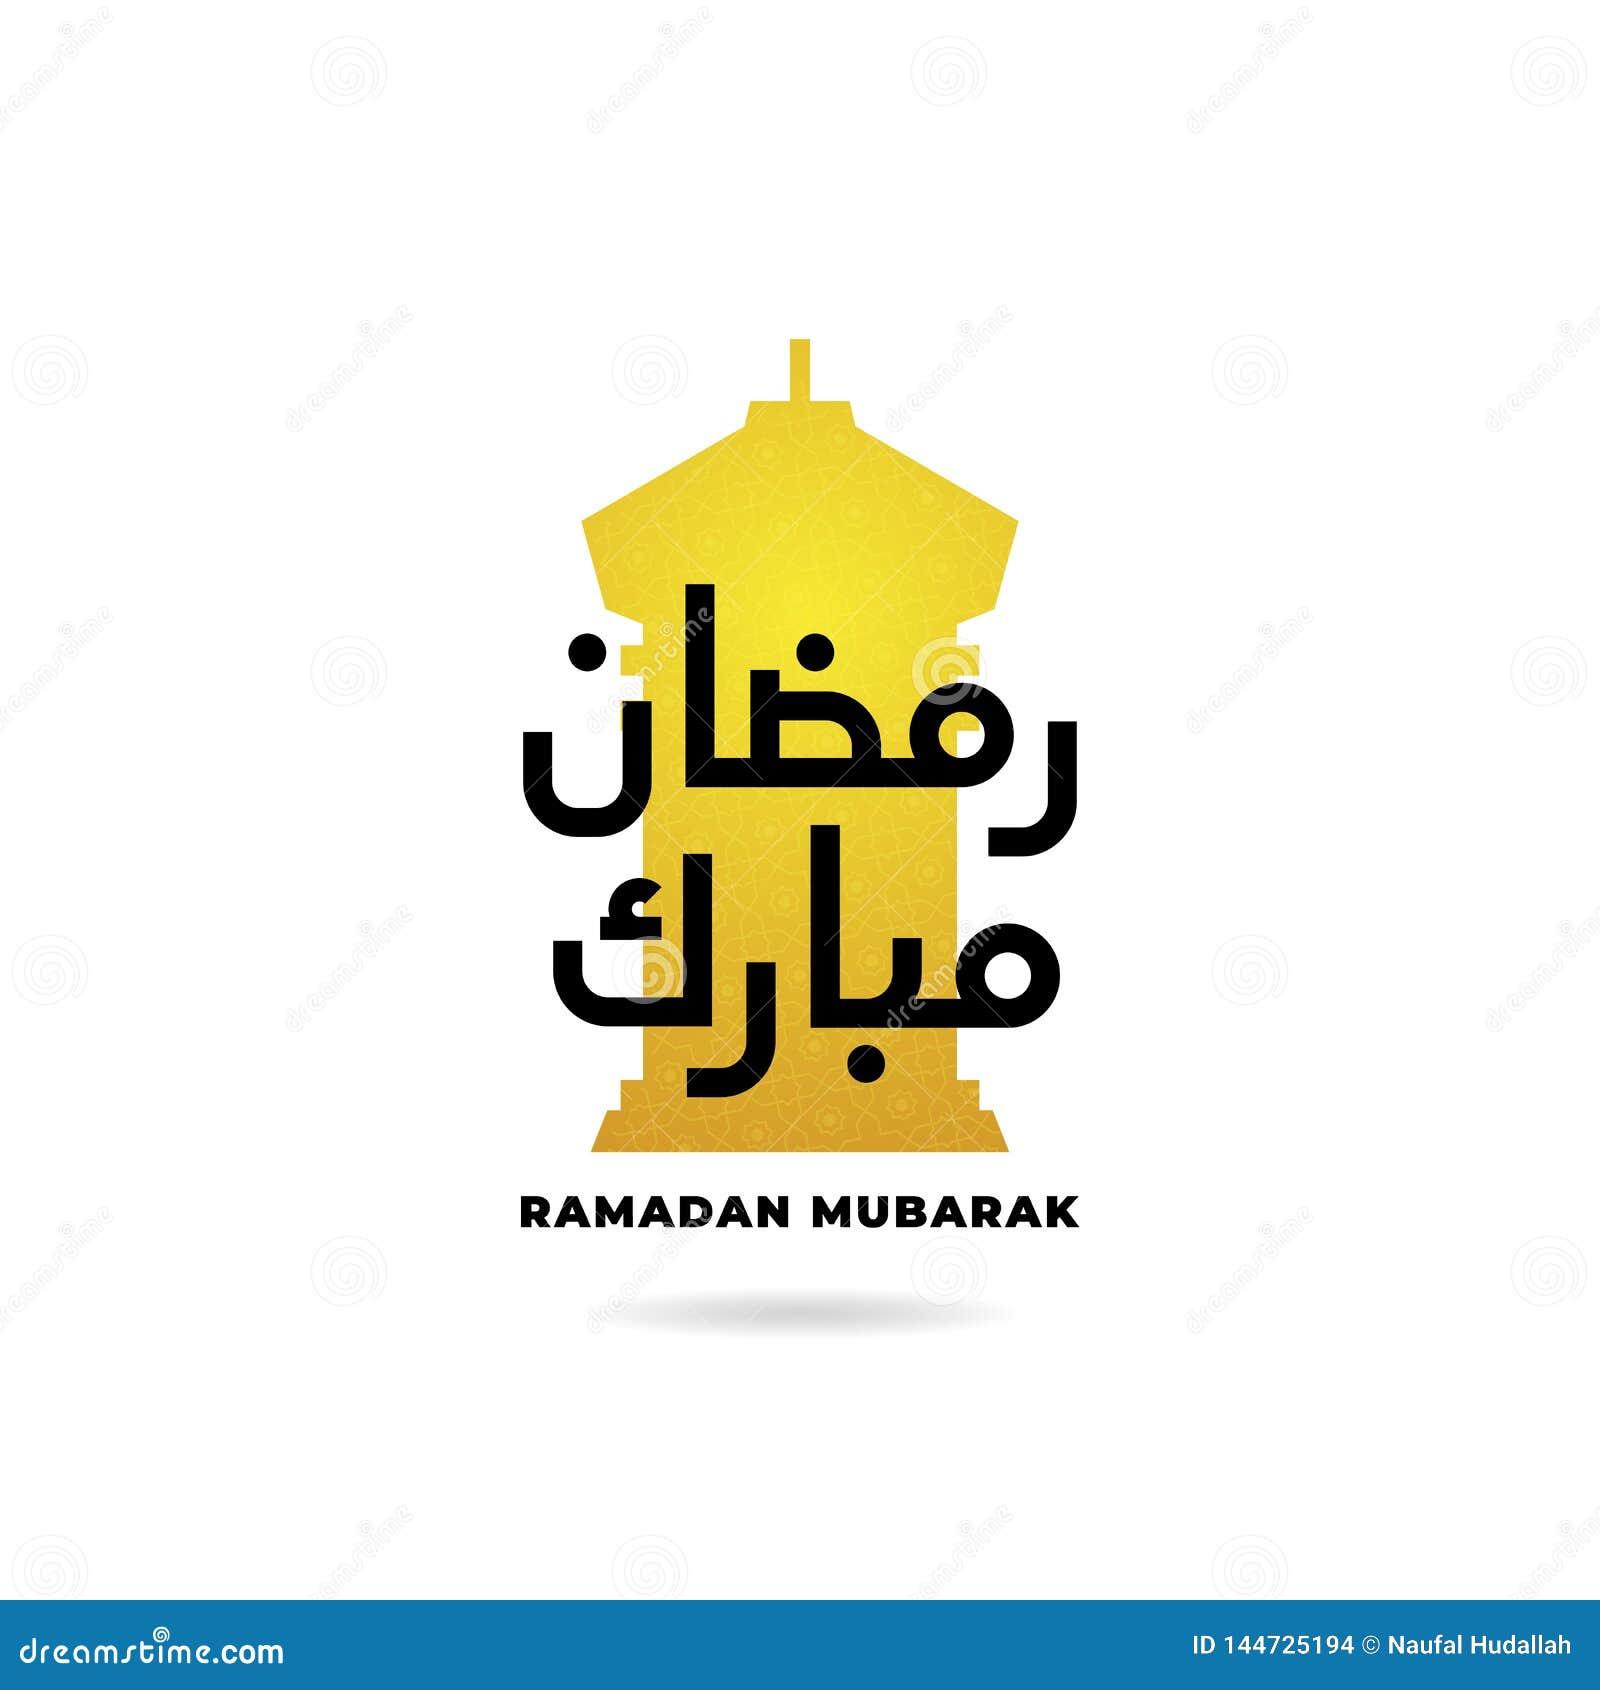 Ramadan mubarak logo badge illustration. arabic calligraphy text with traditional lantern background design